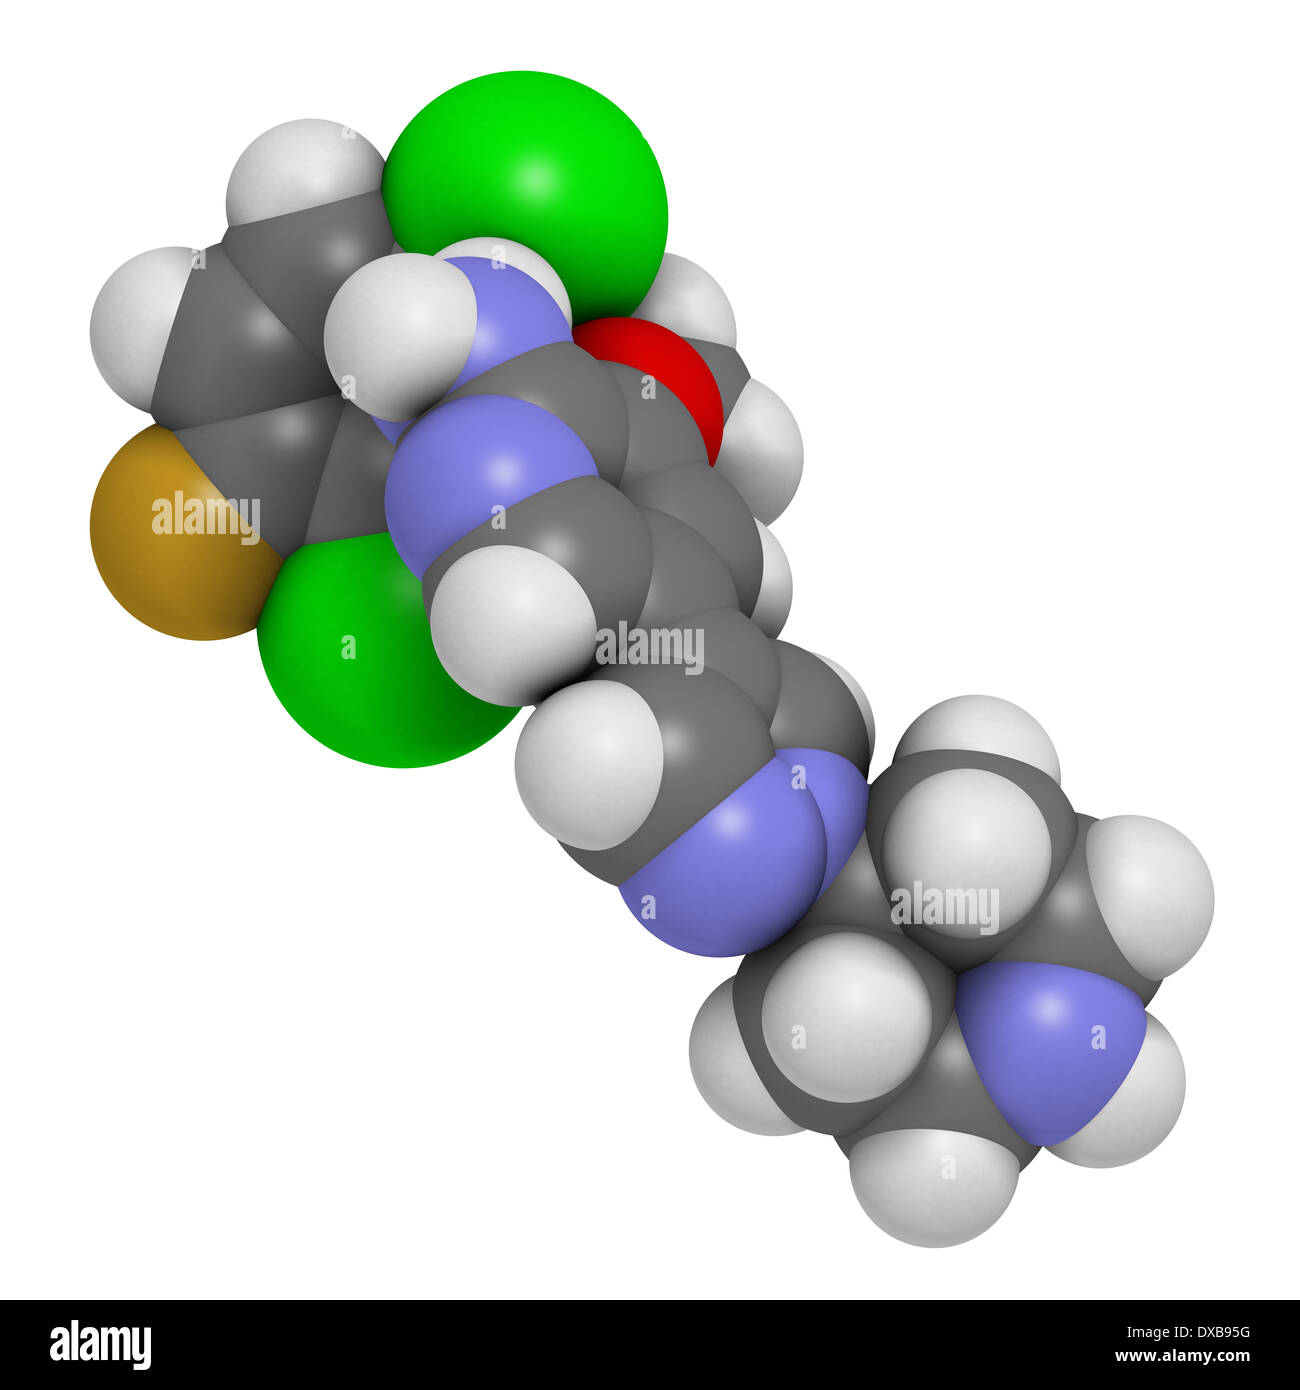 Crizotinib anti-cancer drug molecule. Inhibitor of ALK and ROS1 proteins. Stock Photo